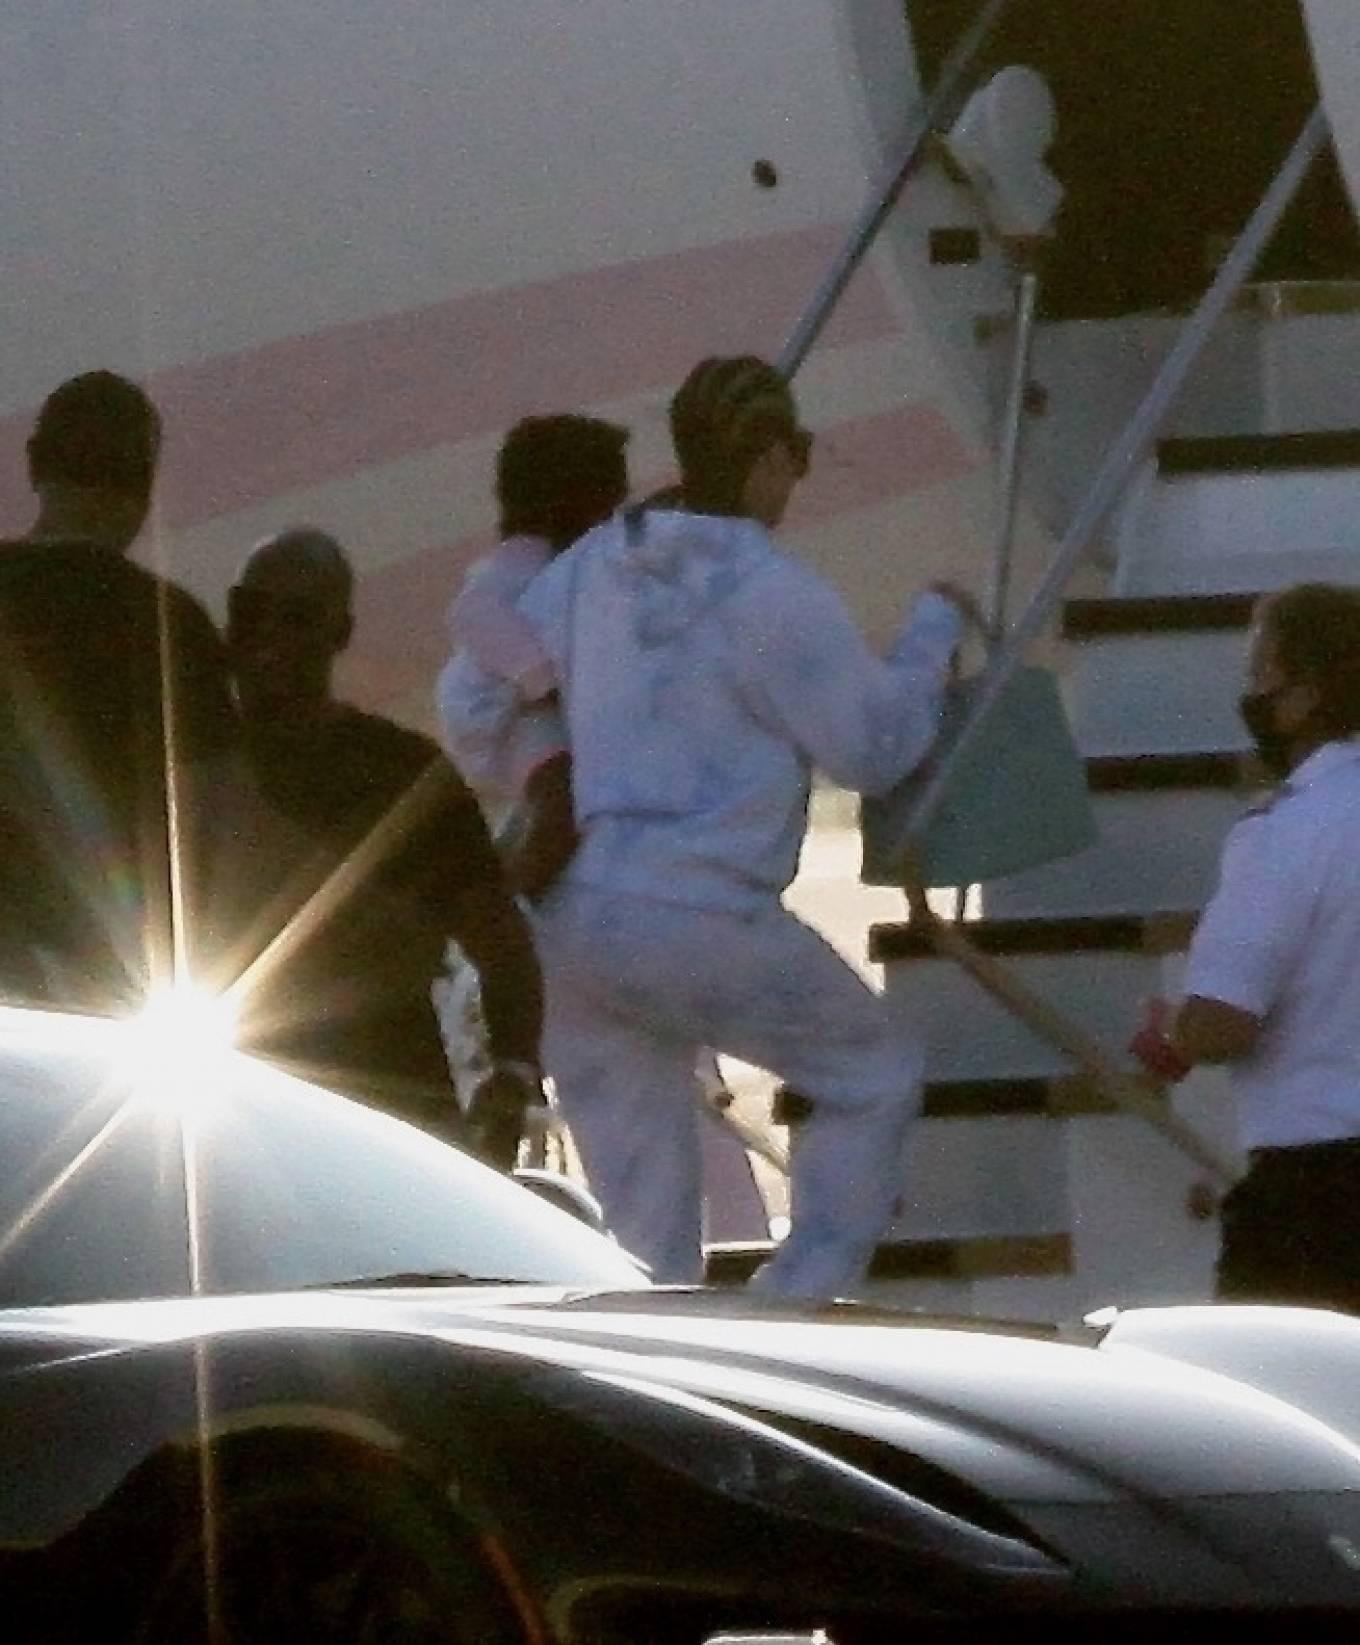 Khloe Kardashian 2020 : Khloe Kardashian and Kourtney Kardashian – Pictured boarding Kylie Jenners private jet in Van Nuys-04